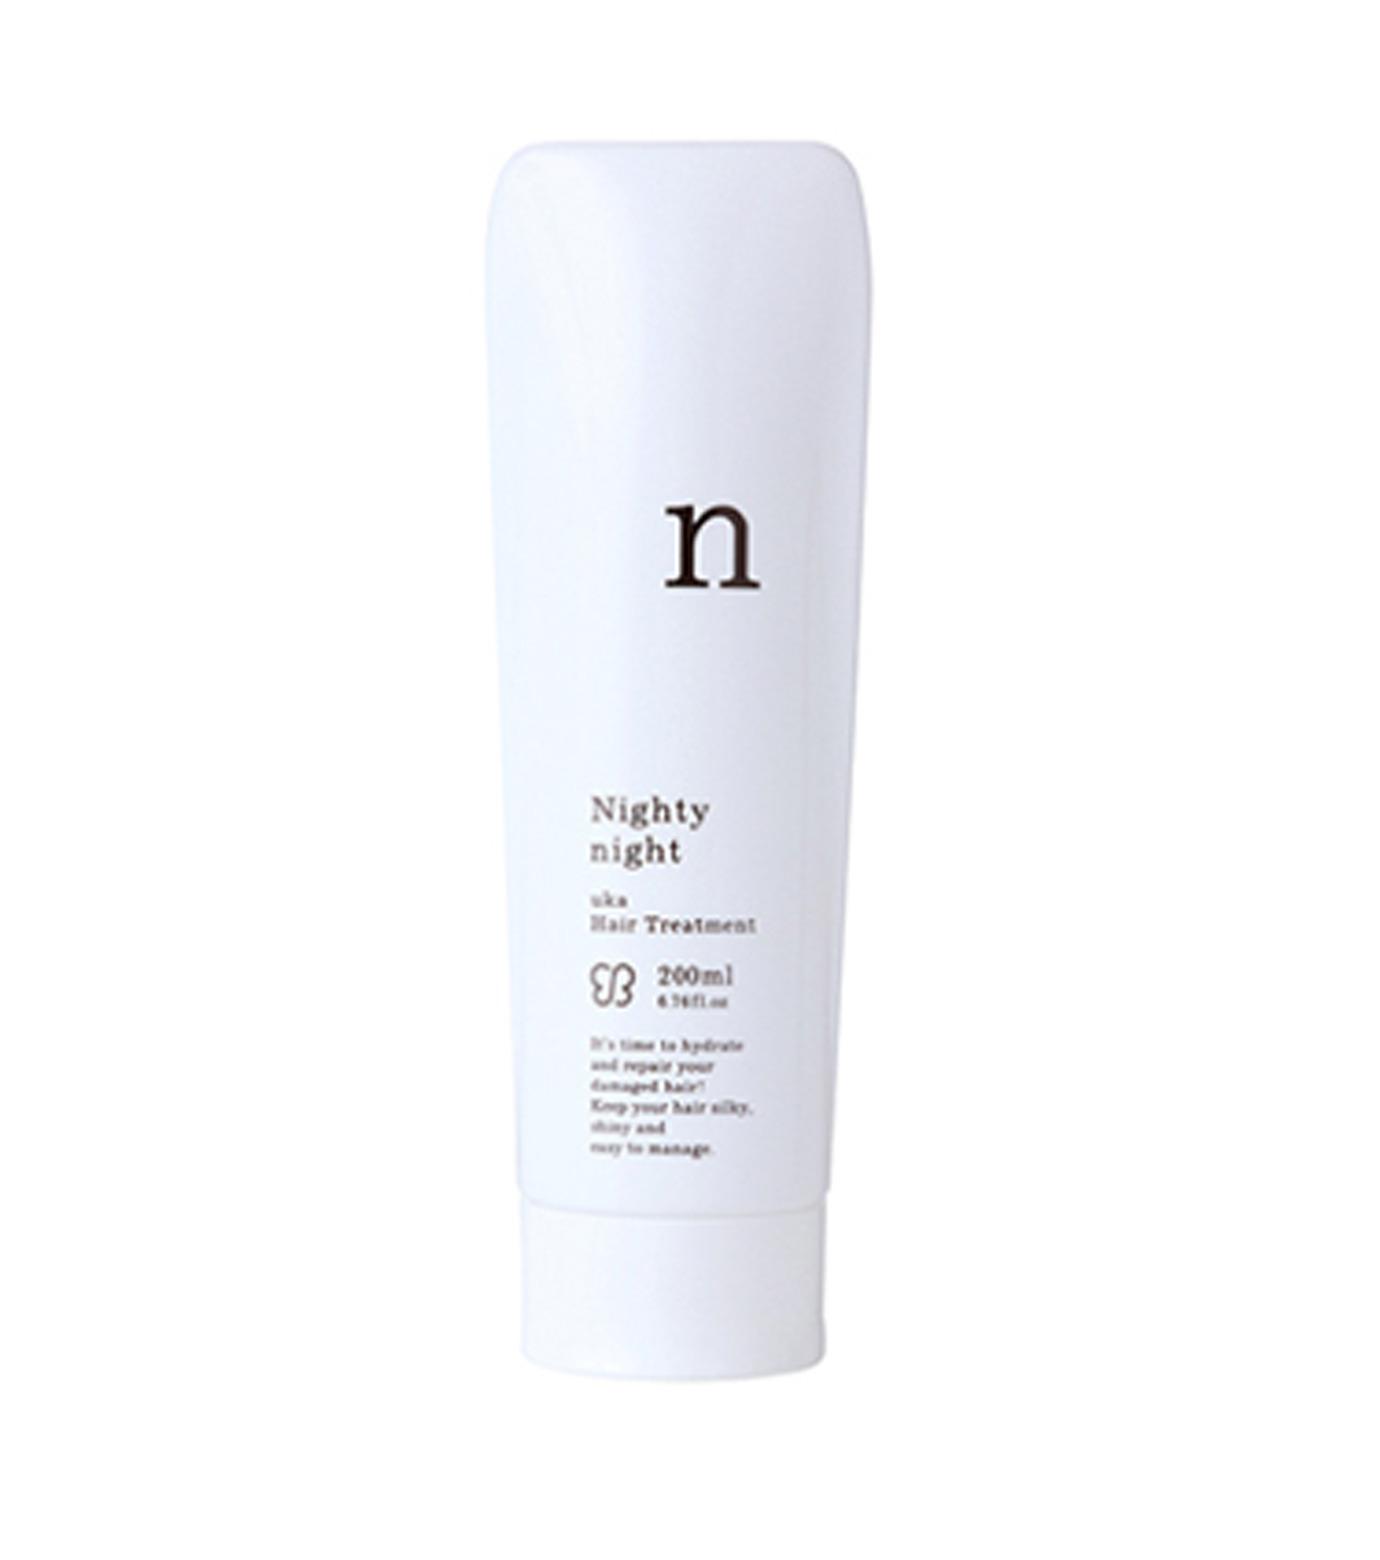 uka(ウカ)のHair Treatment -Nighty Night--WHITE(HAIR-CARE/HAIR-CARE)-3000005-4 拡大詳細画像1